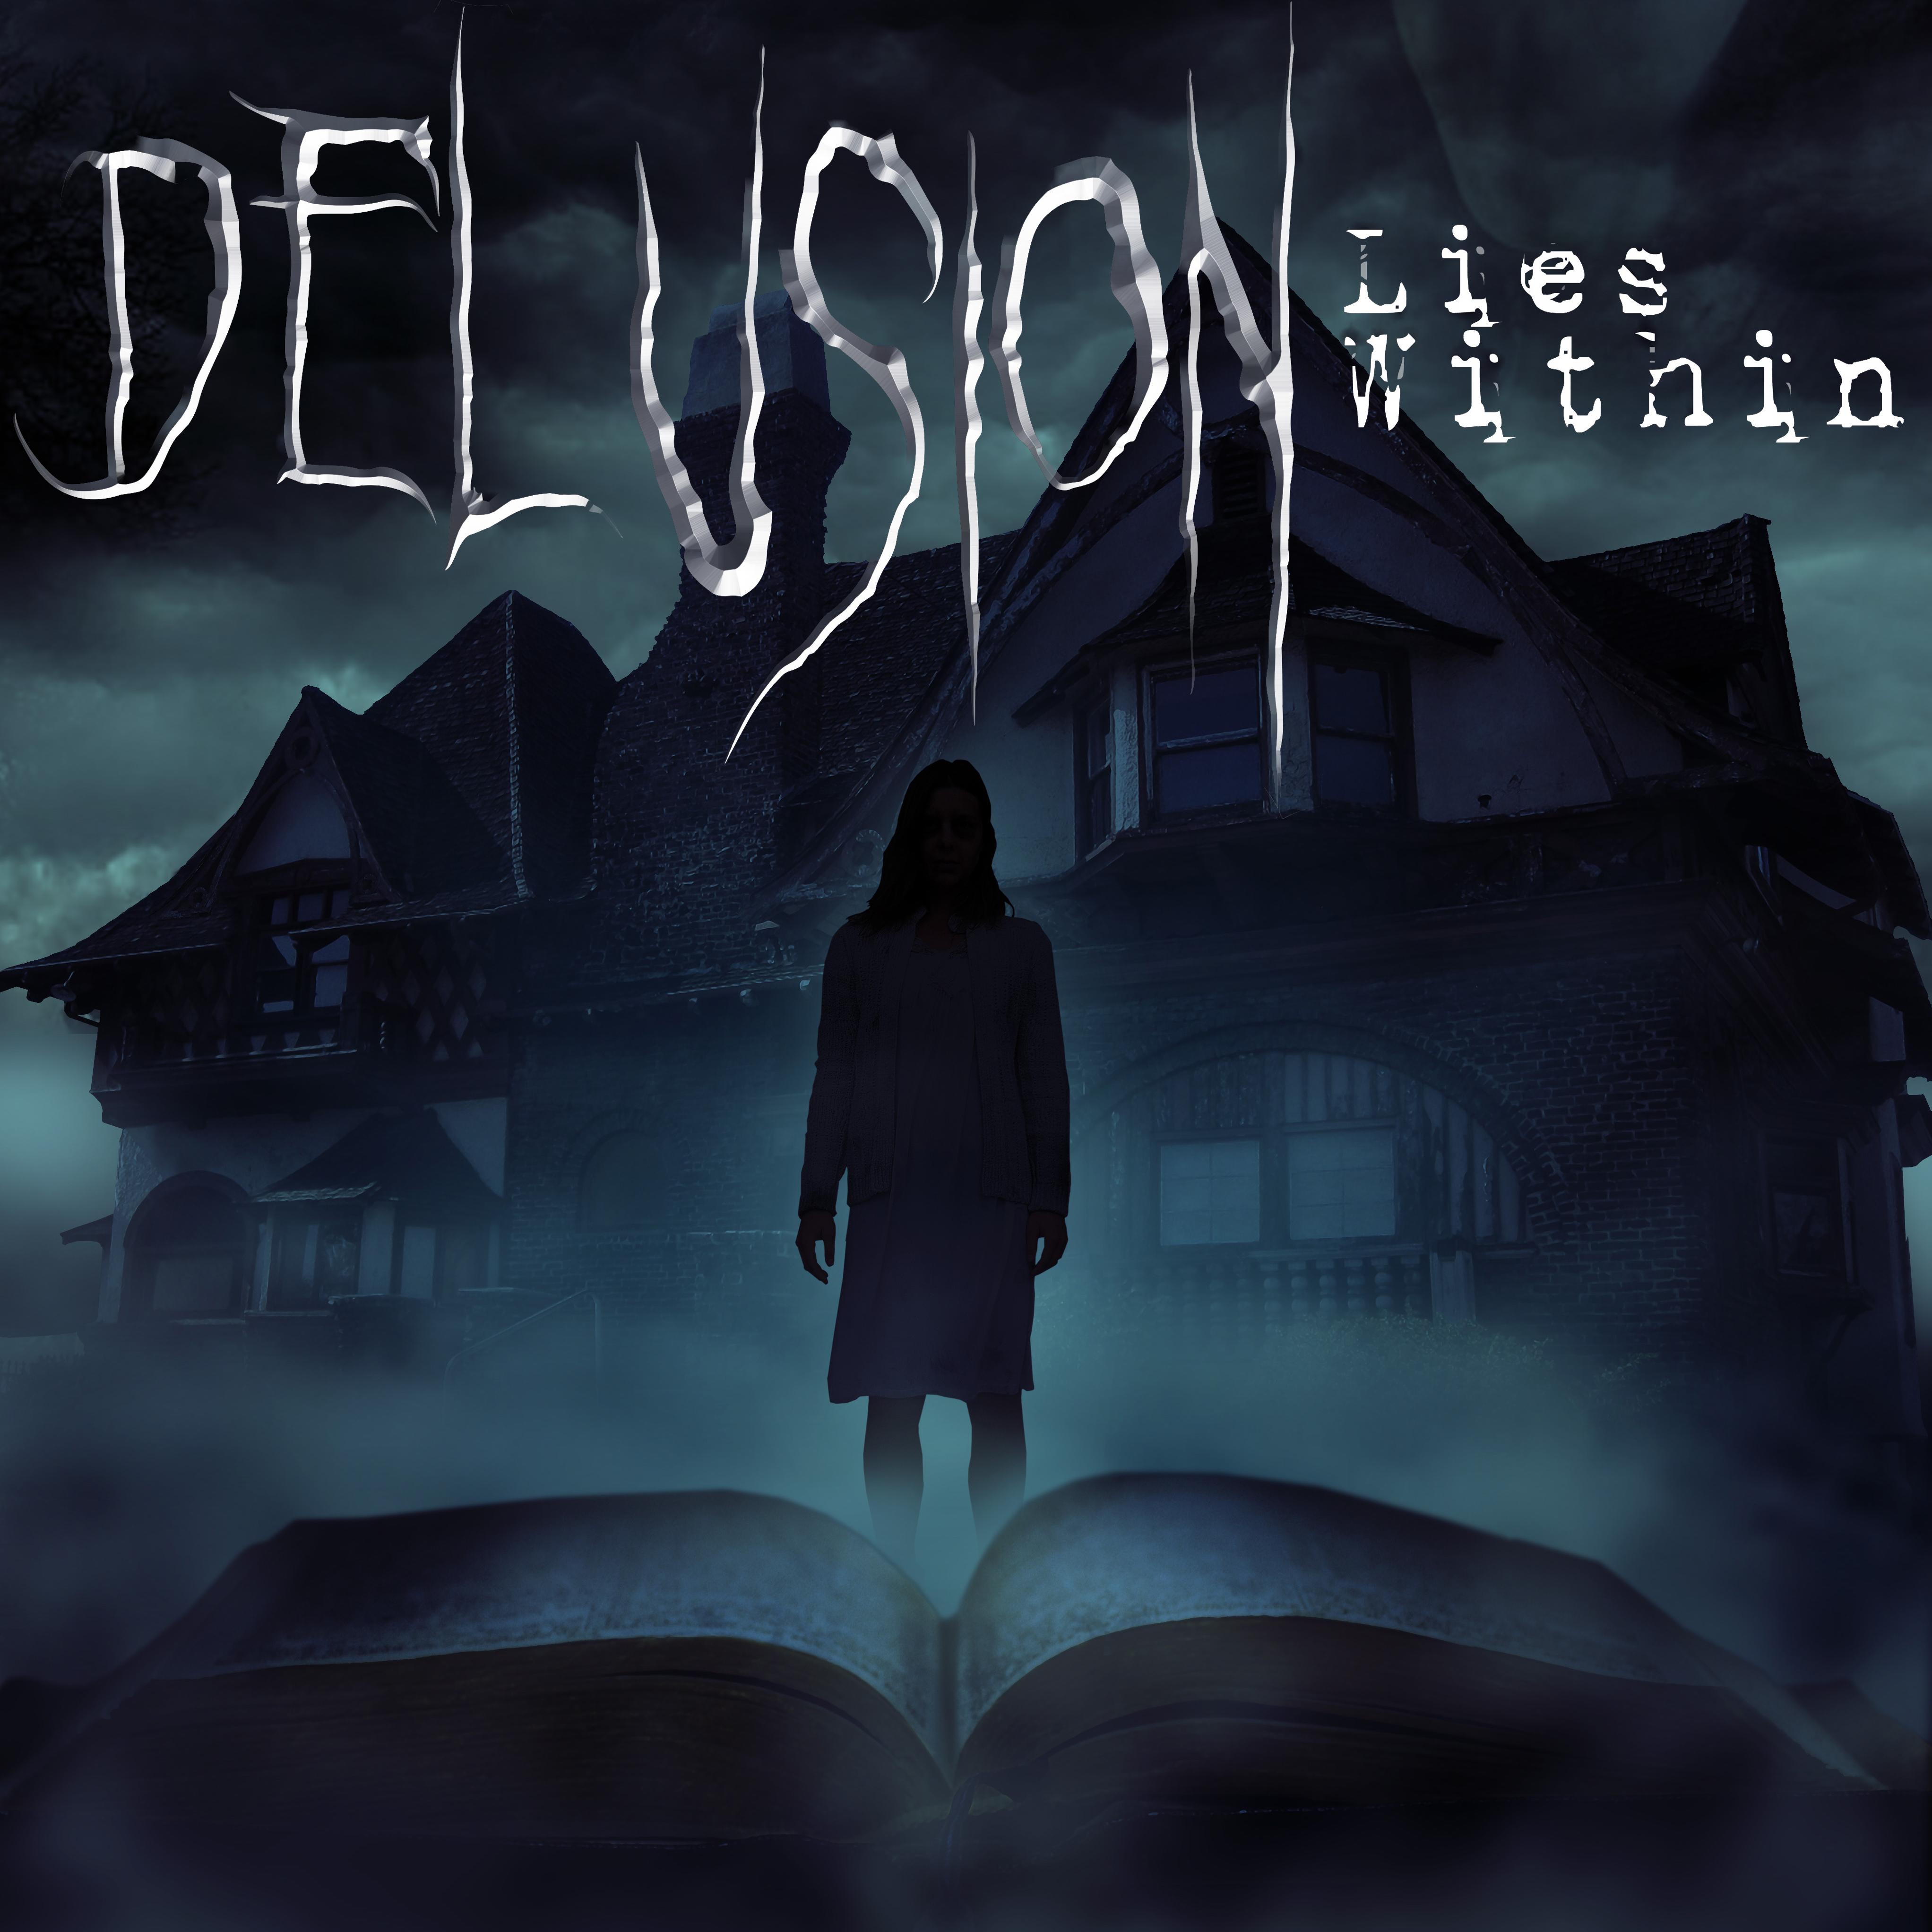 Delusion: Main Image